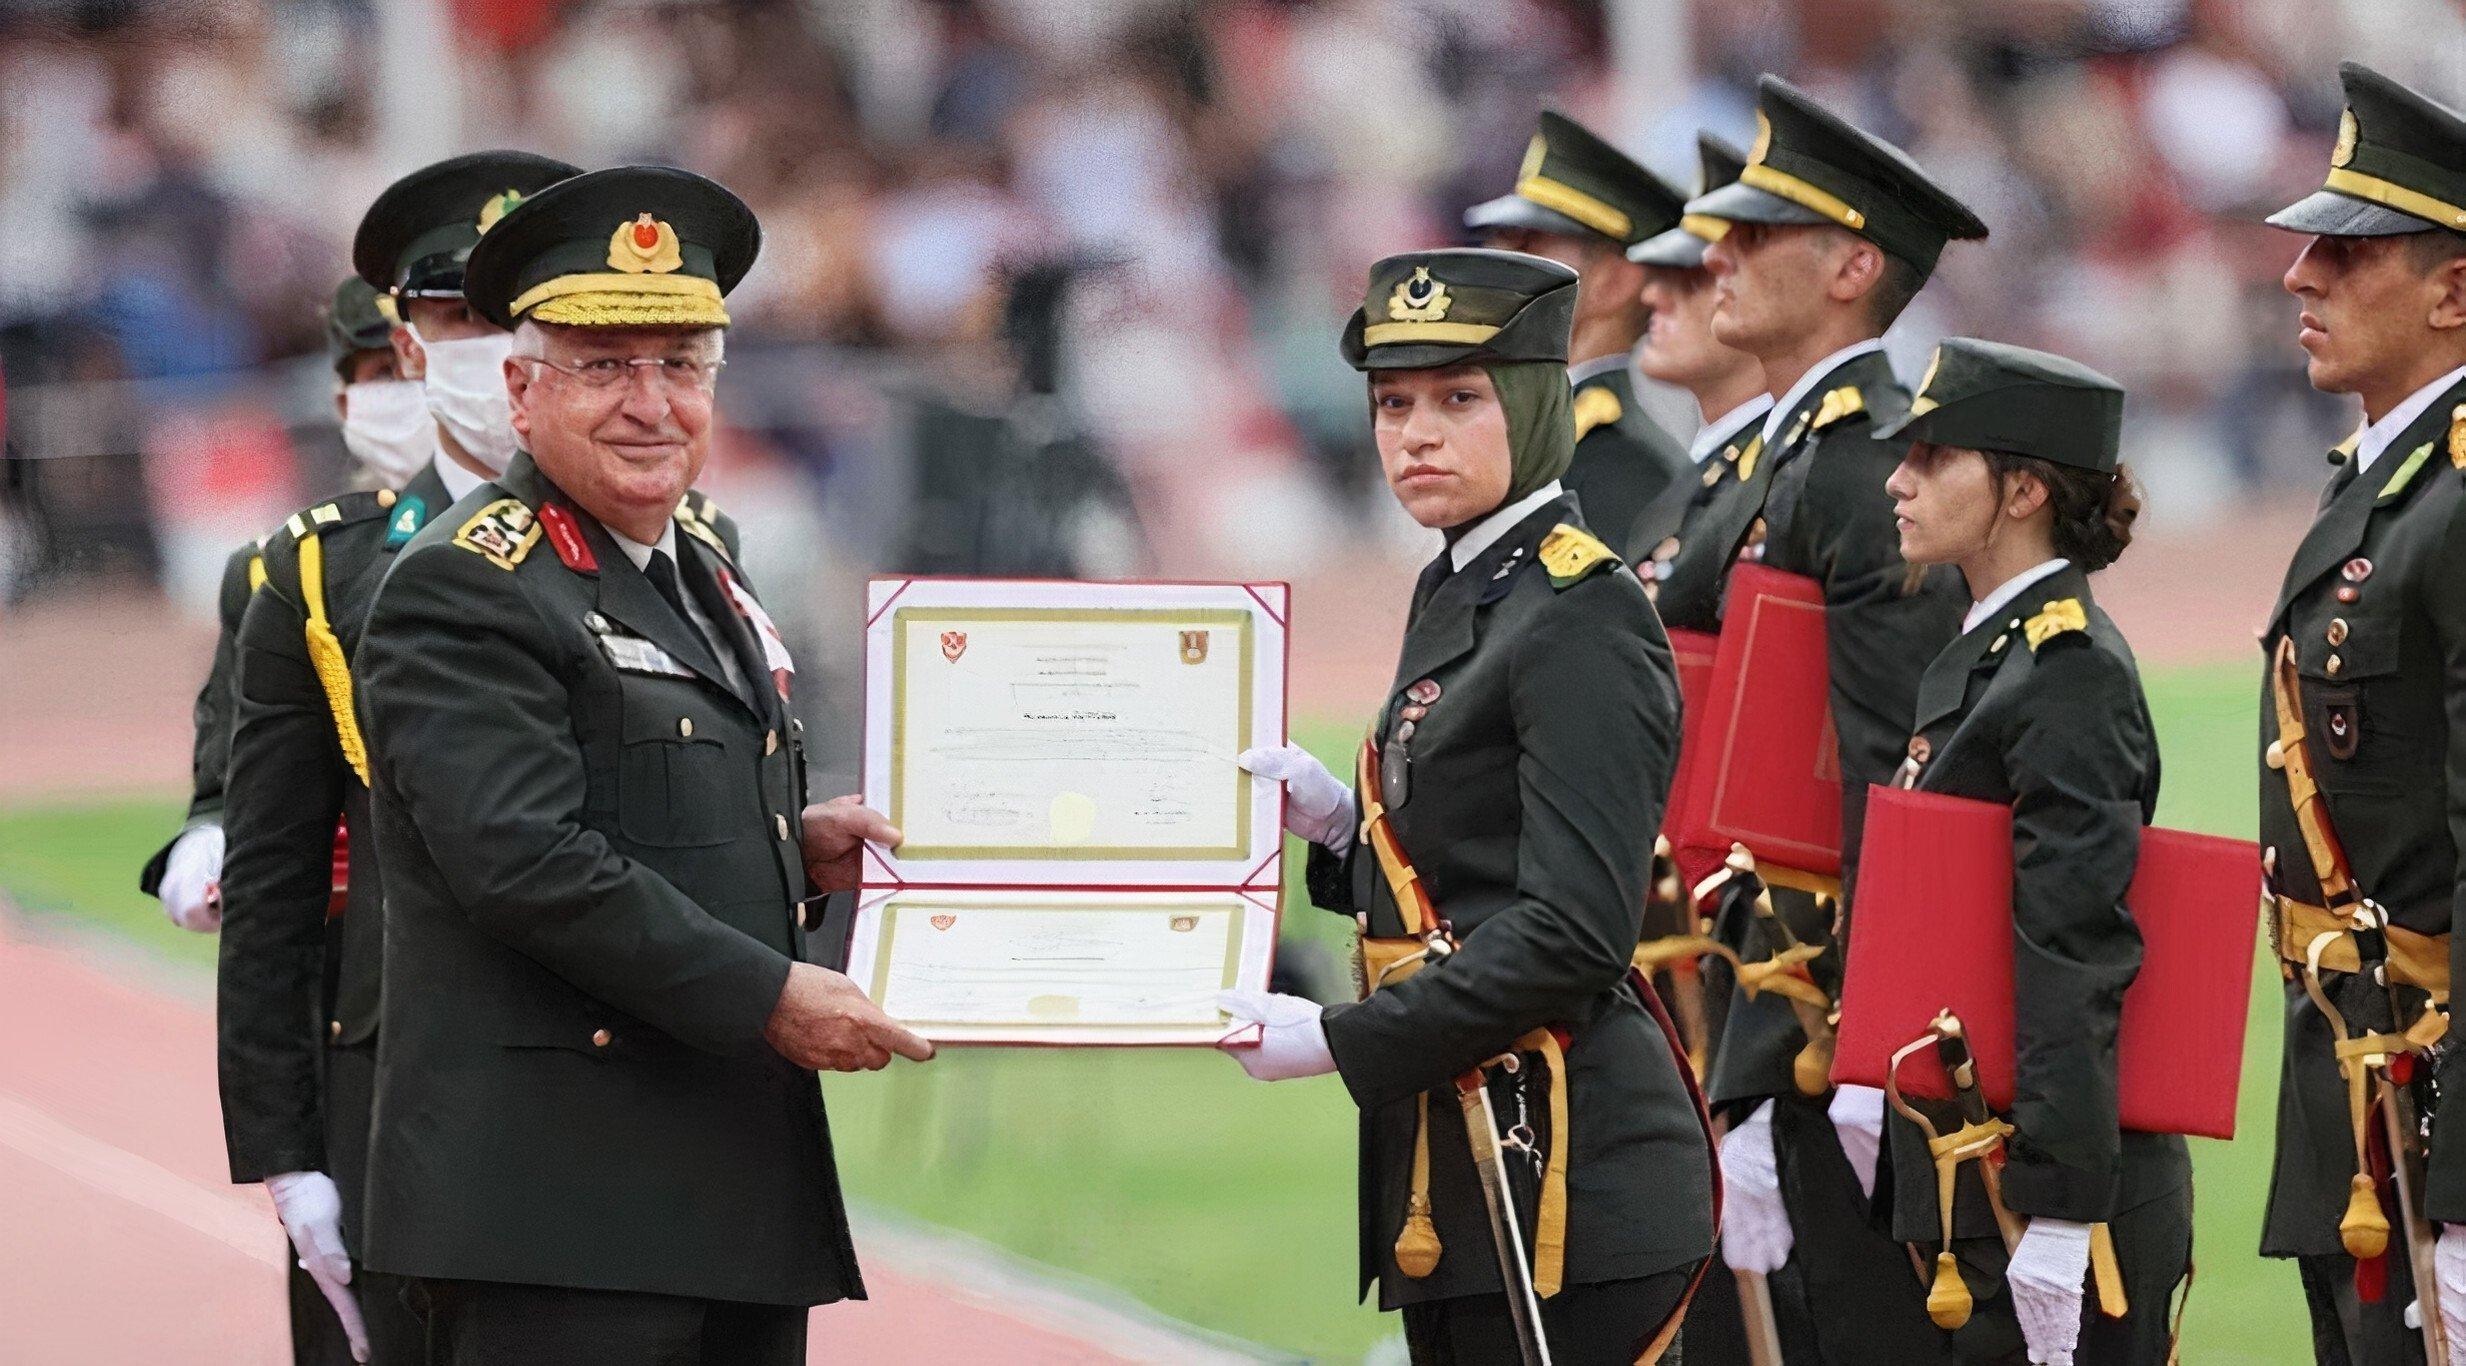 Lt. Müberra Öztürk receives her diploma from Chief of Staff Gen. Yaşar Güler in Istanbul, Turkey, Aug. 31, 2021. (AA Photo)